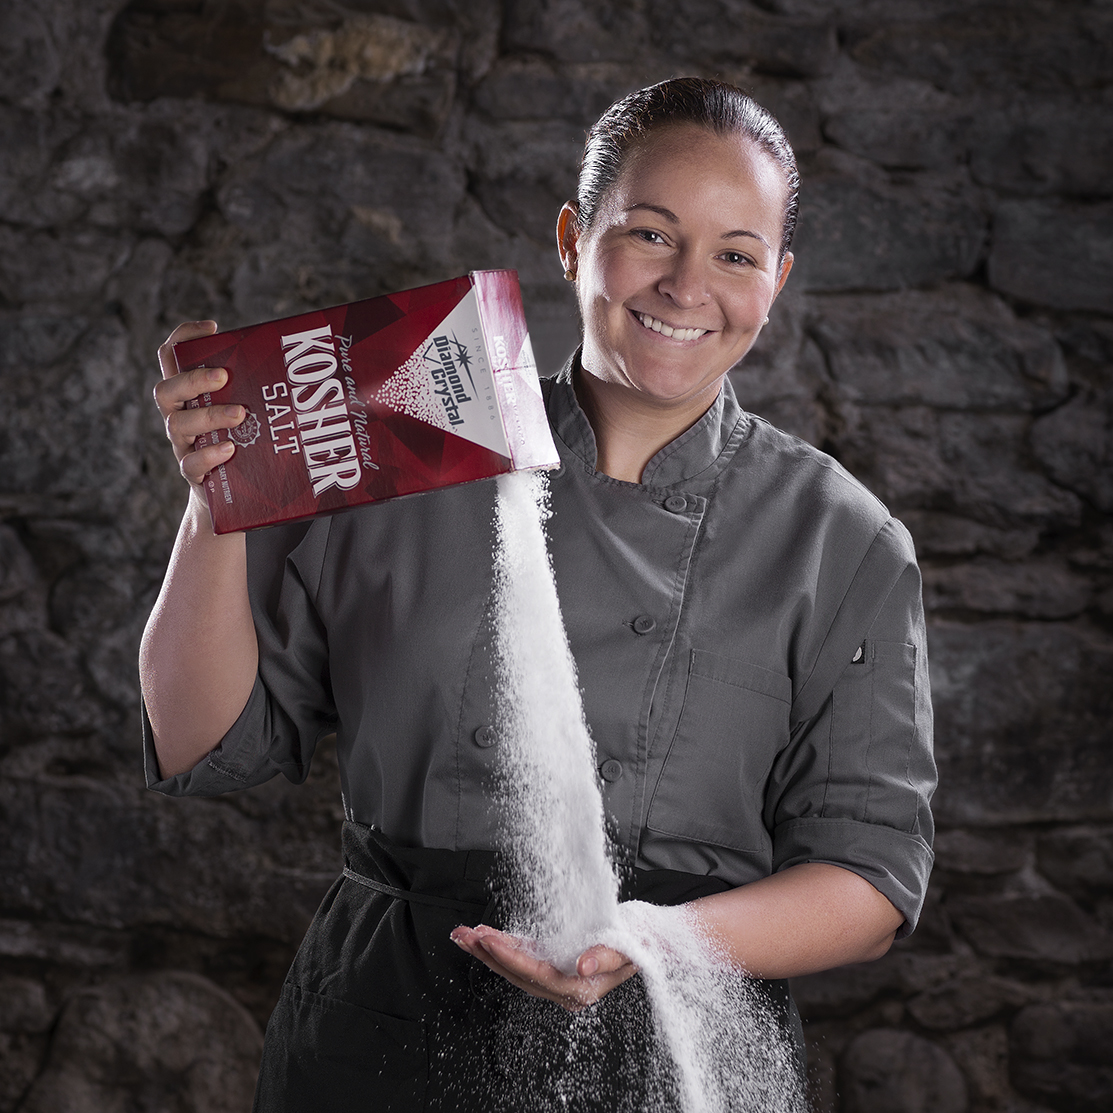 Forest City Cookbook - Chef Carla Cooper - Garlics of London - Ontario (sq).jpg